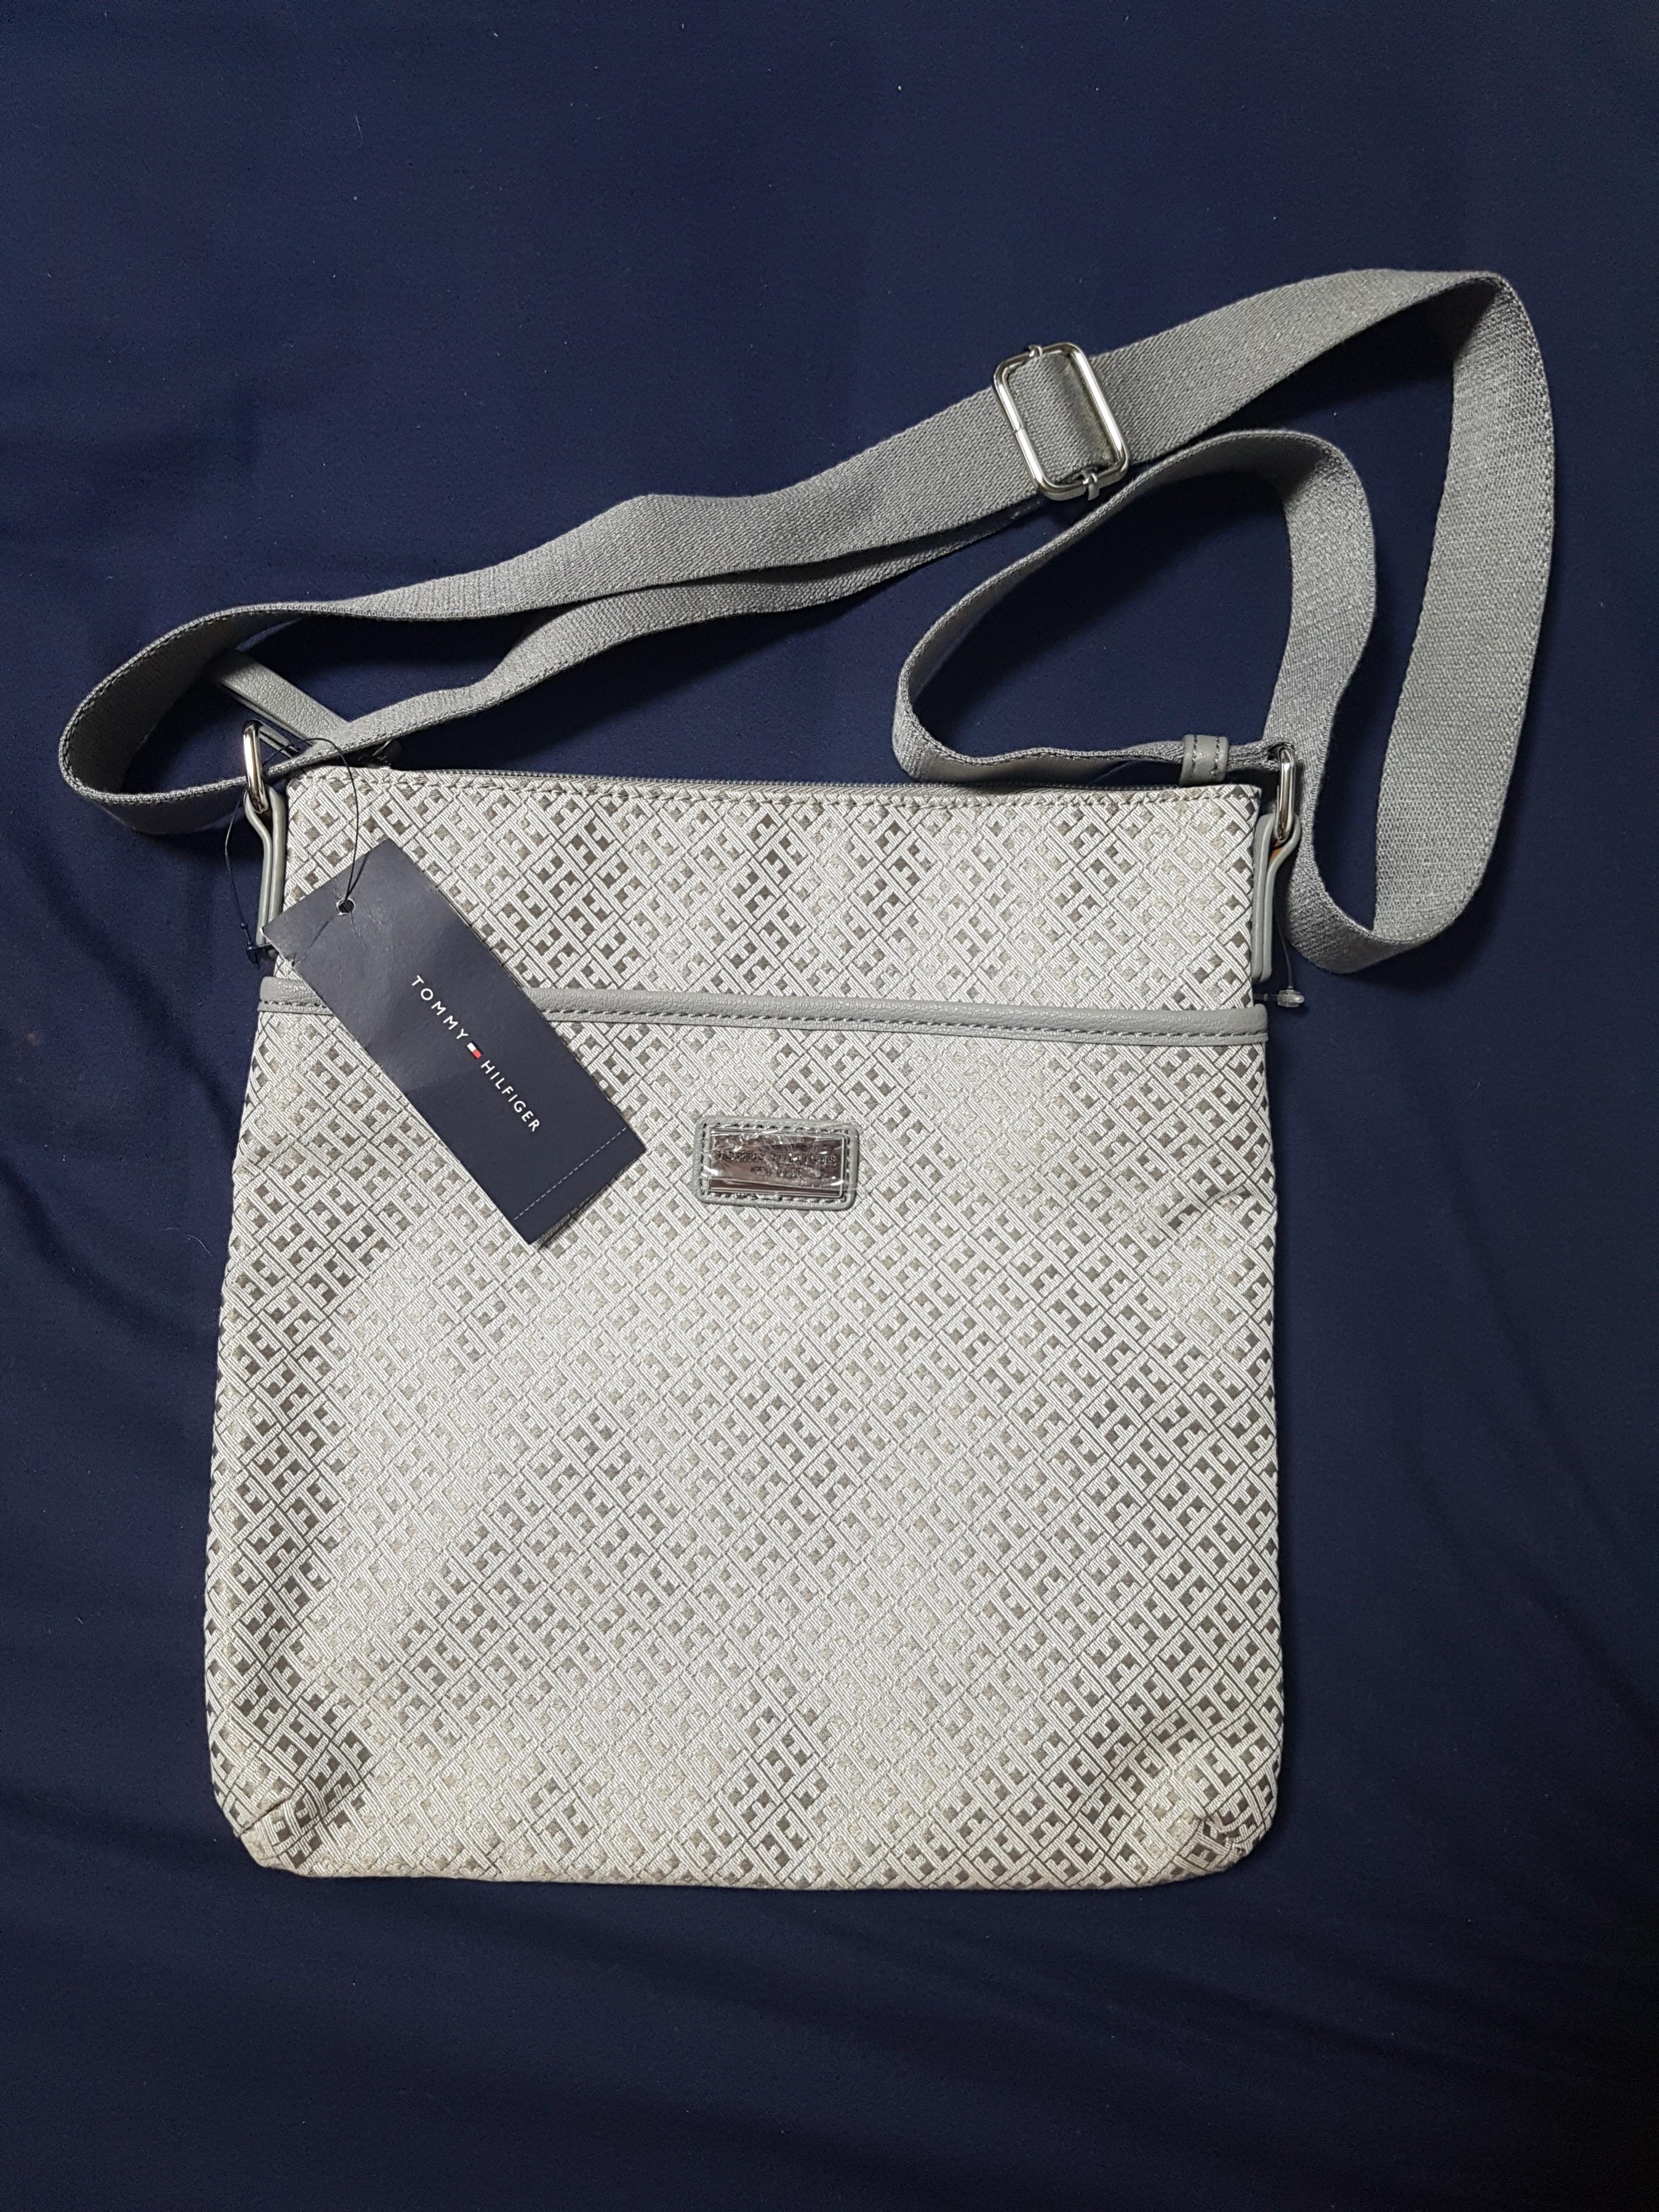 0f8e23538af Authentic Tommy Hilfiger Crossbody Bag BIG DISCOUNT, Women s Fashion ...